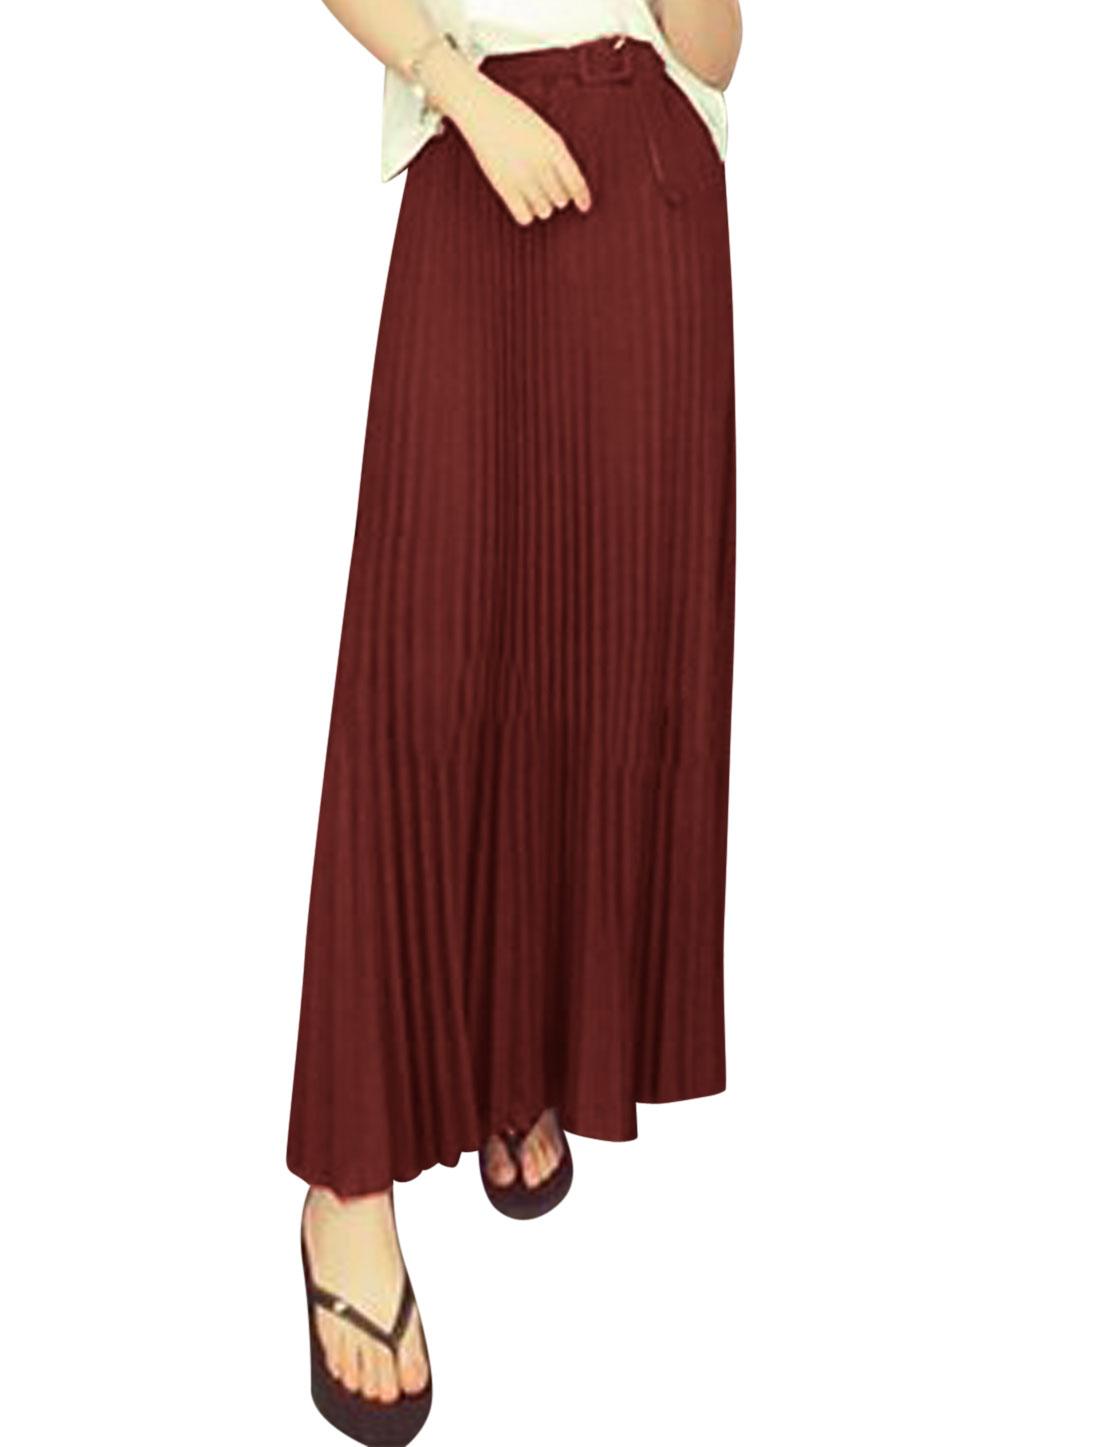 Women Mid Rise Elastic Waist w Belt Casual Maxi Skirt Burgundy XS